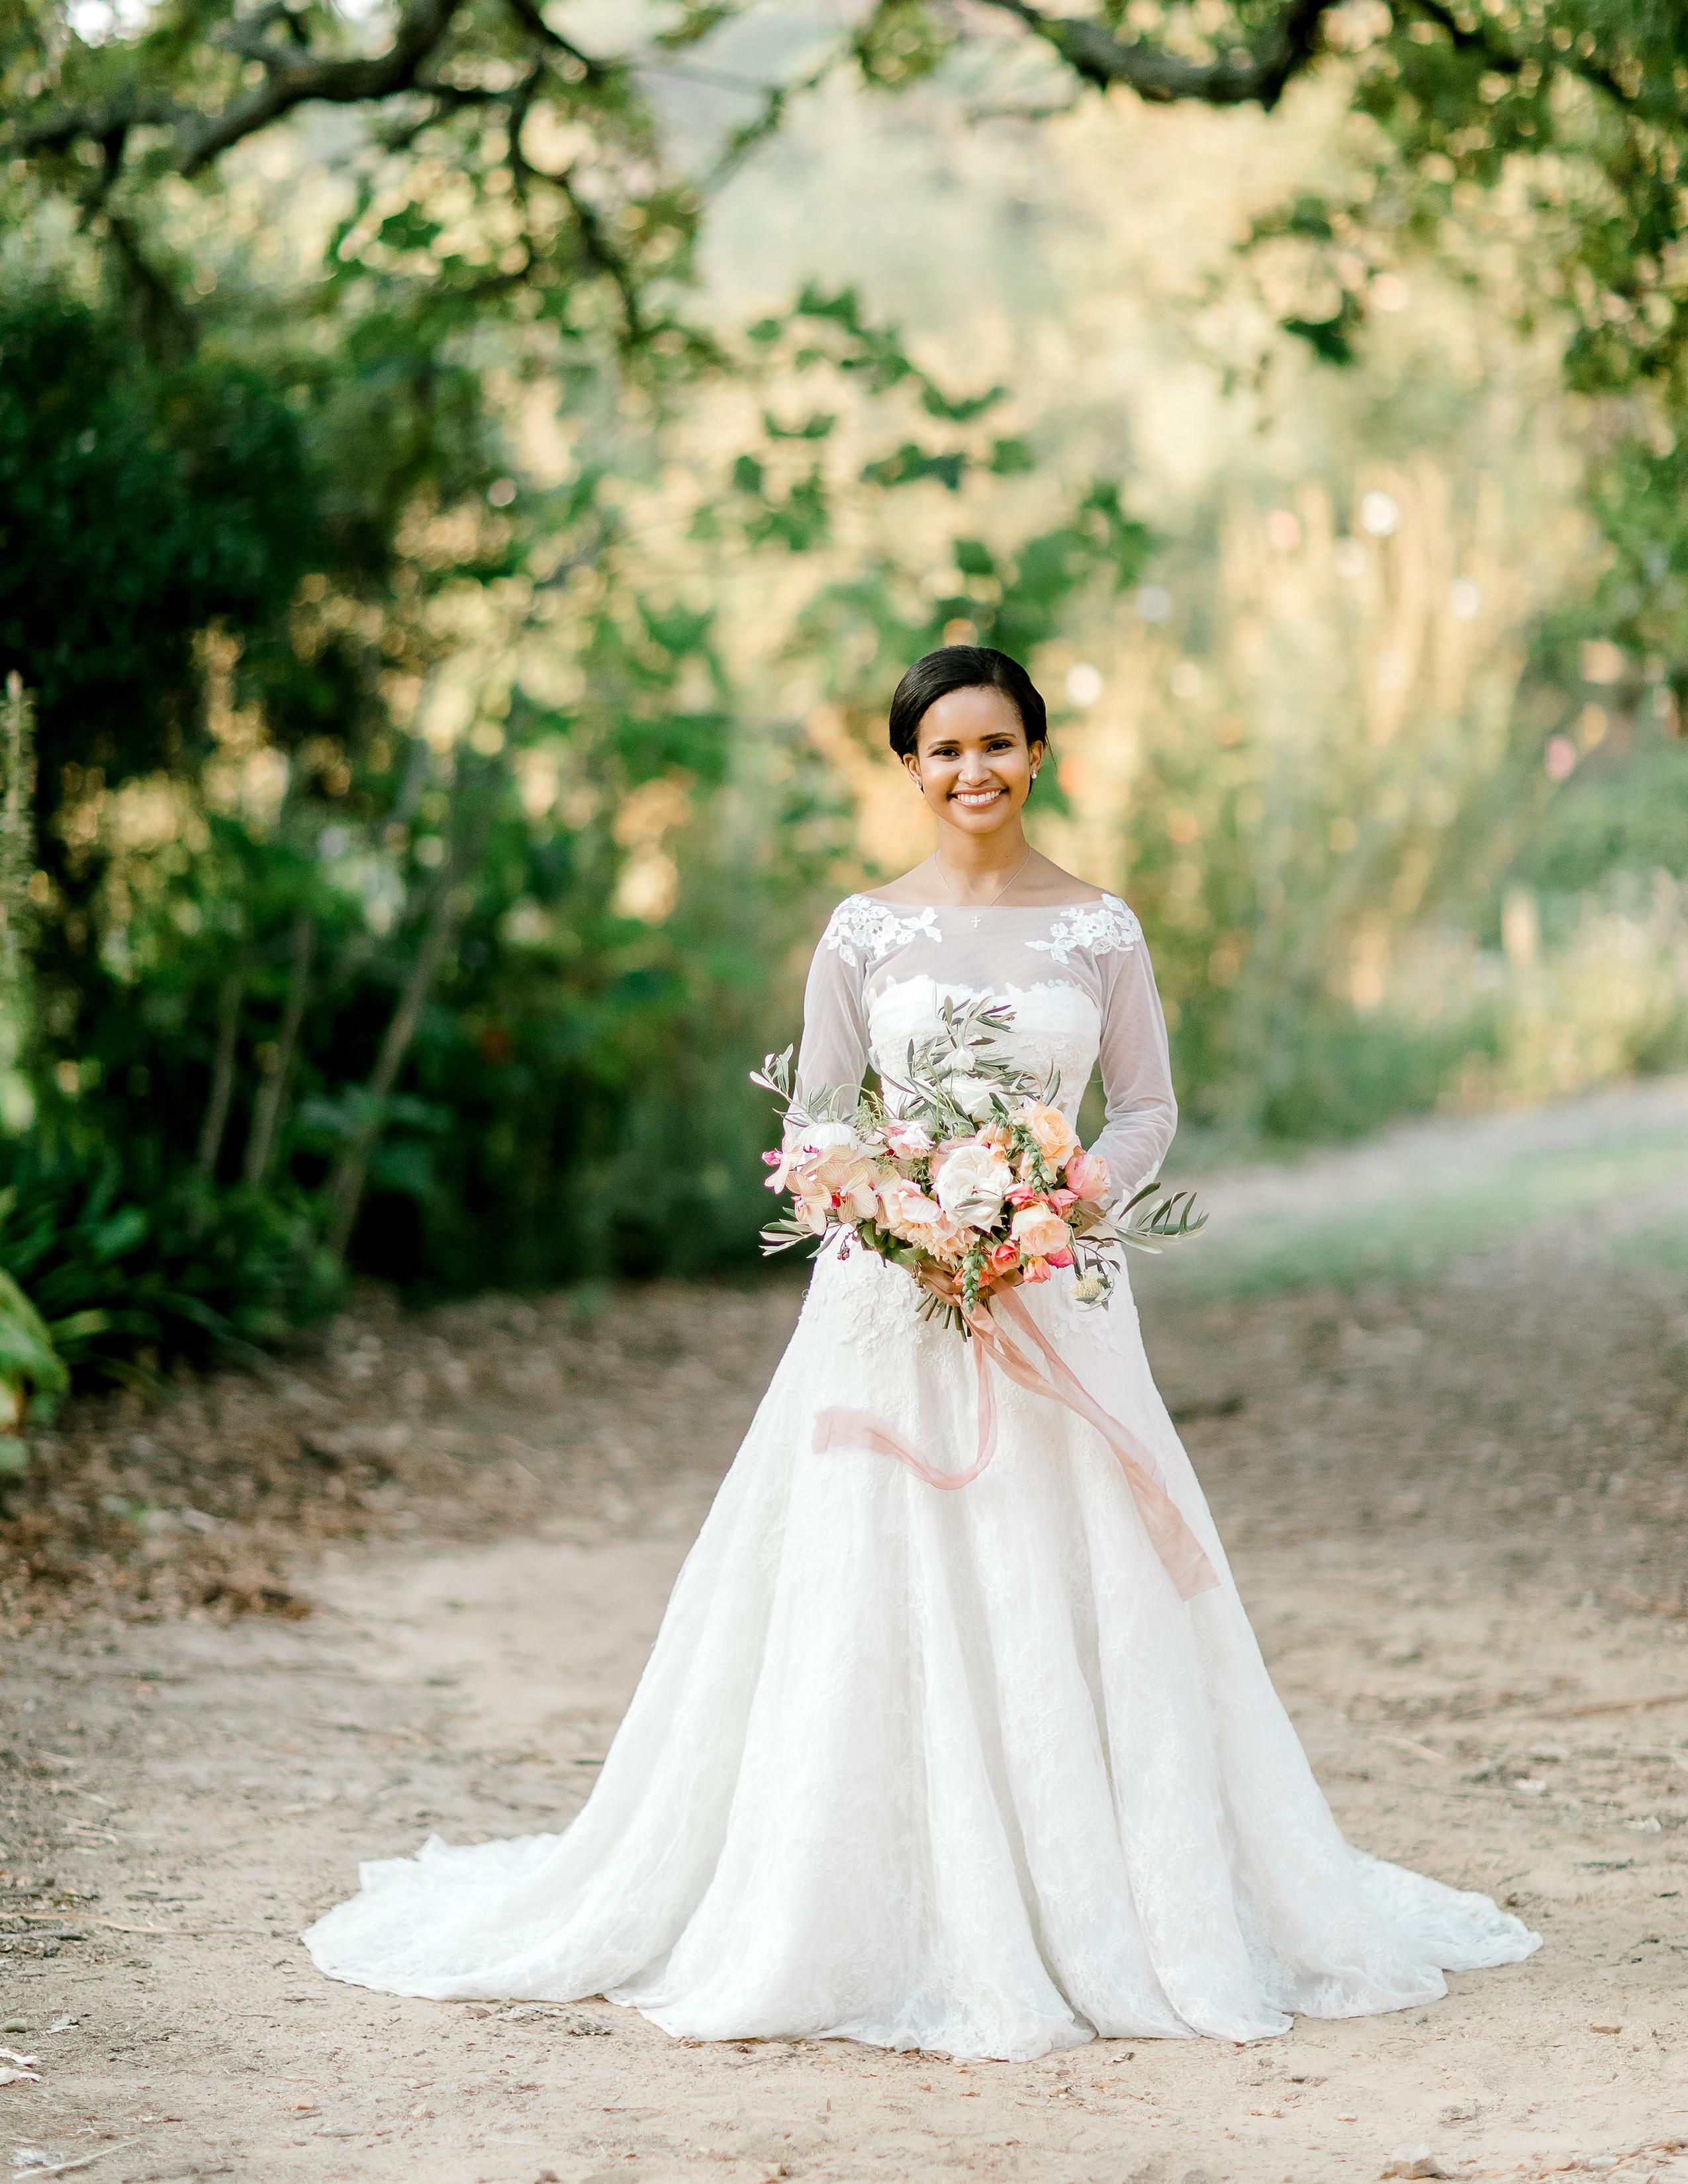 rorisang stephen wedding bride in wedding dress